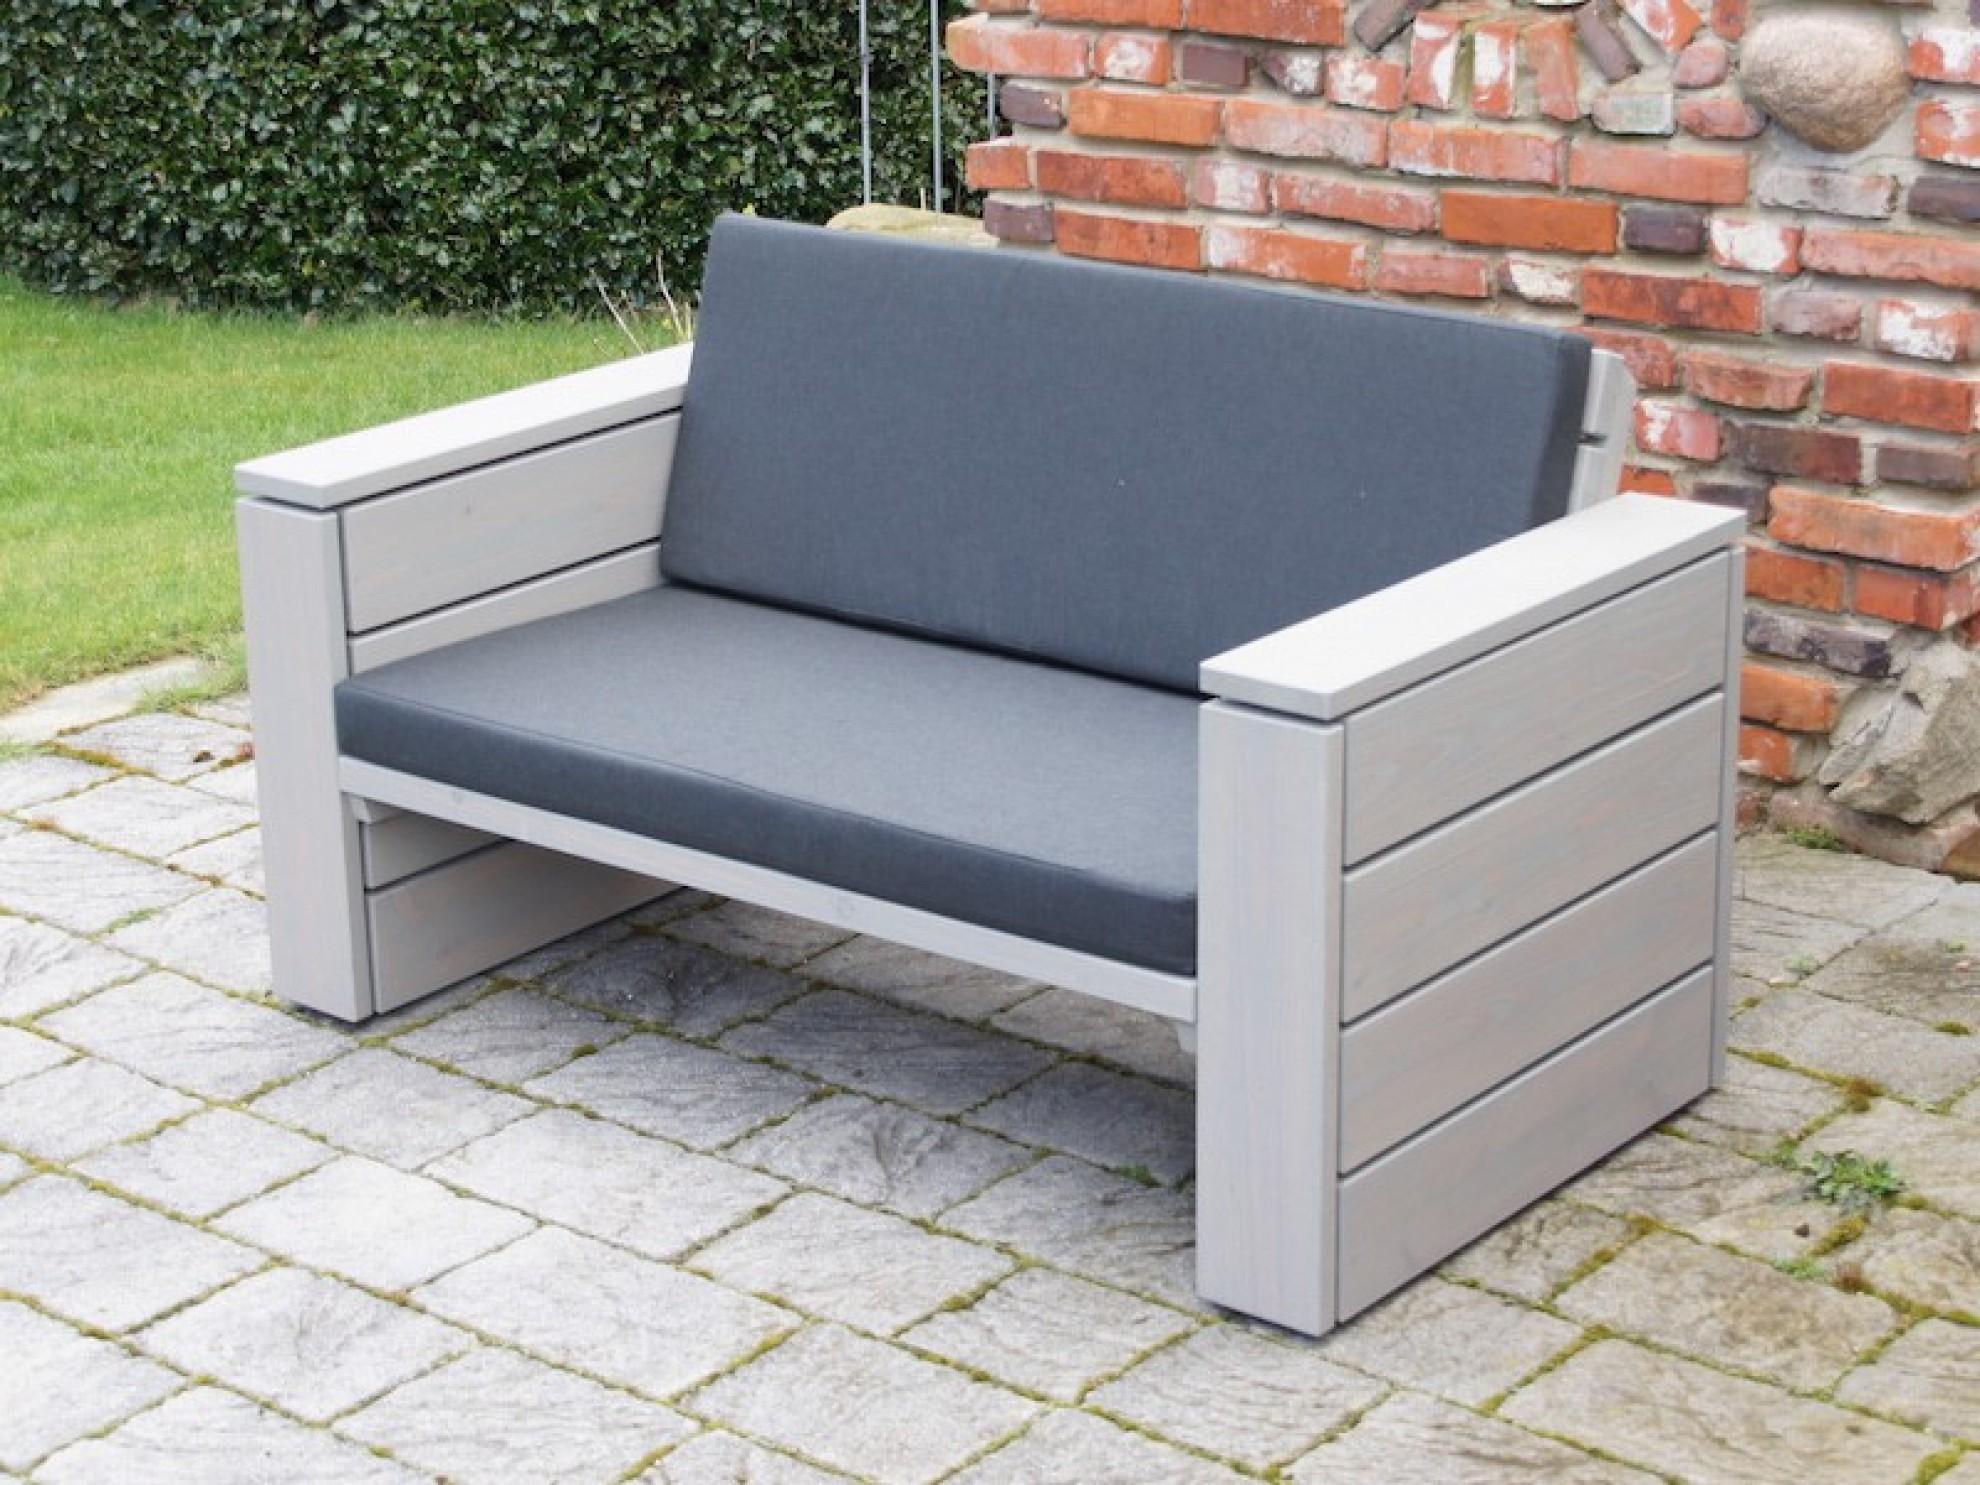 Lounge sessel holz  Lounge Sessel XL - Zeitlose Loungemöbel aus heimischem Holz